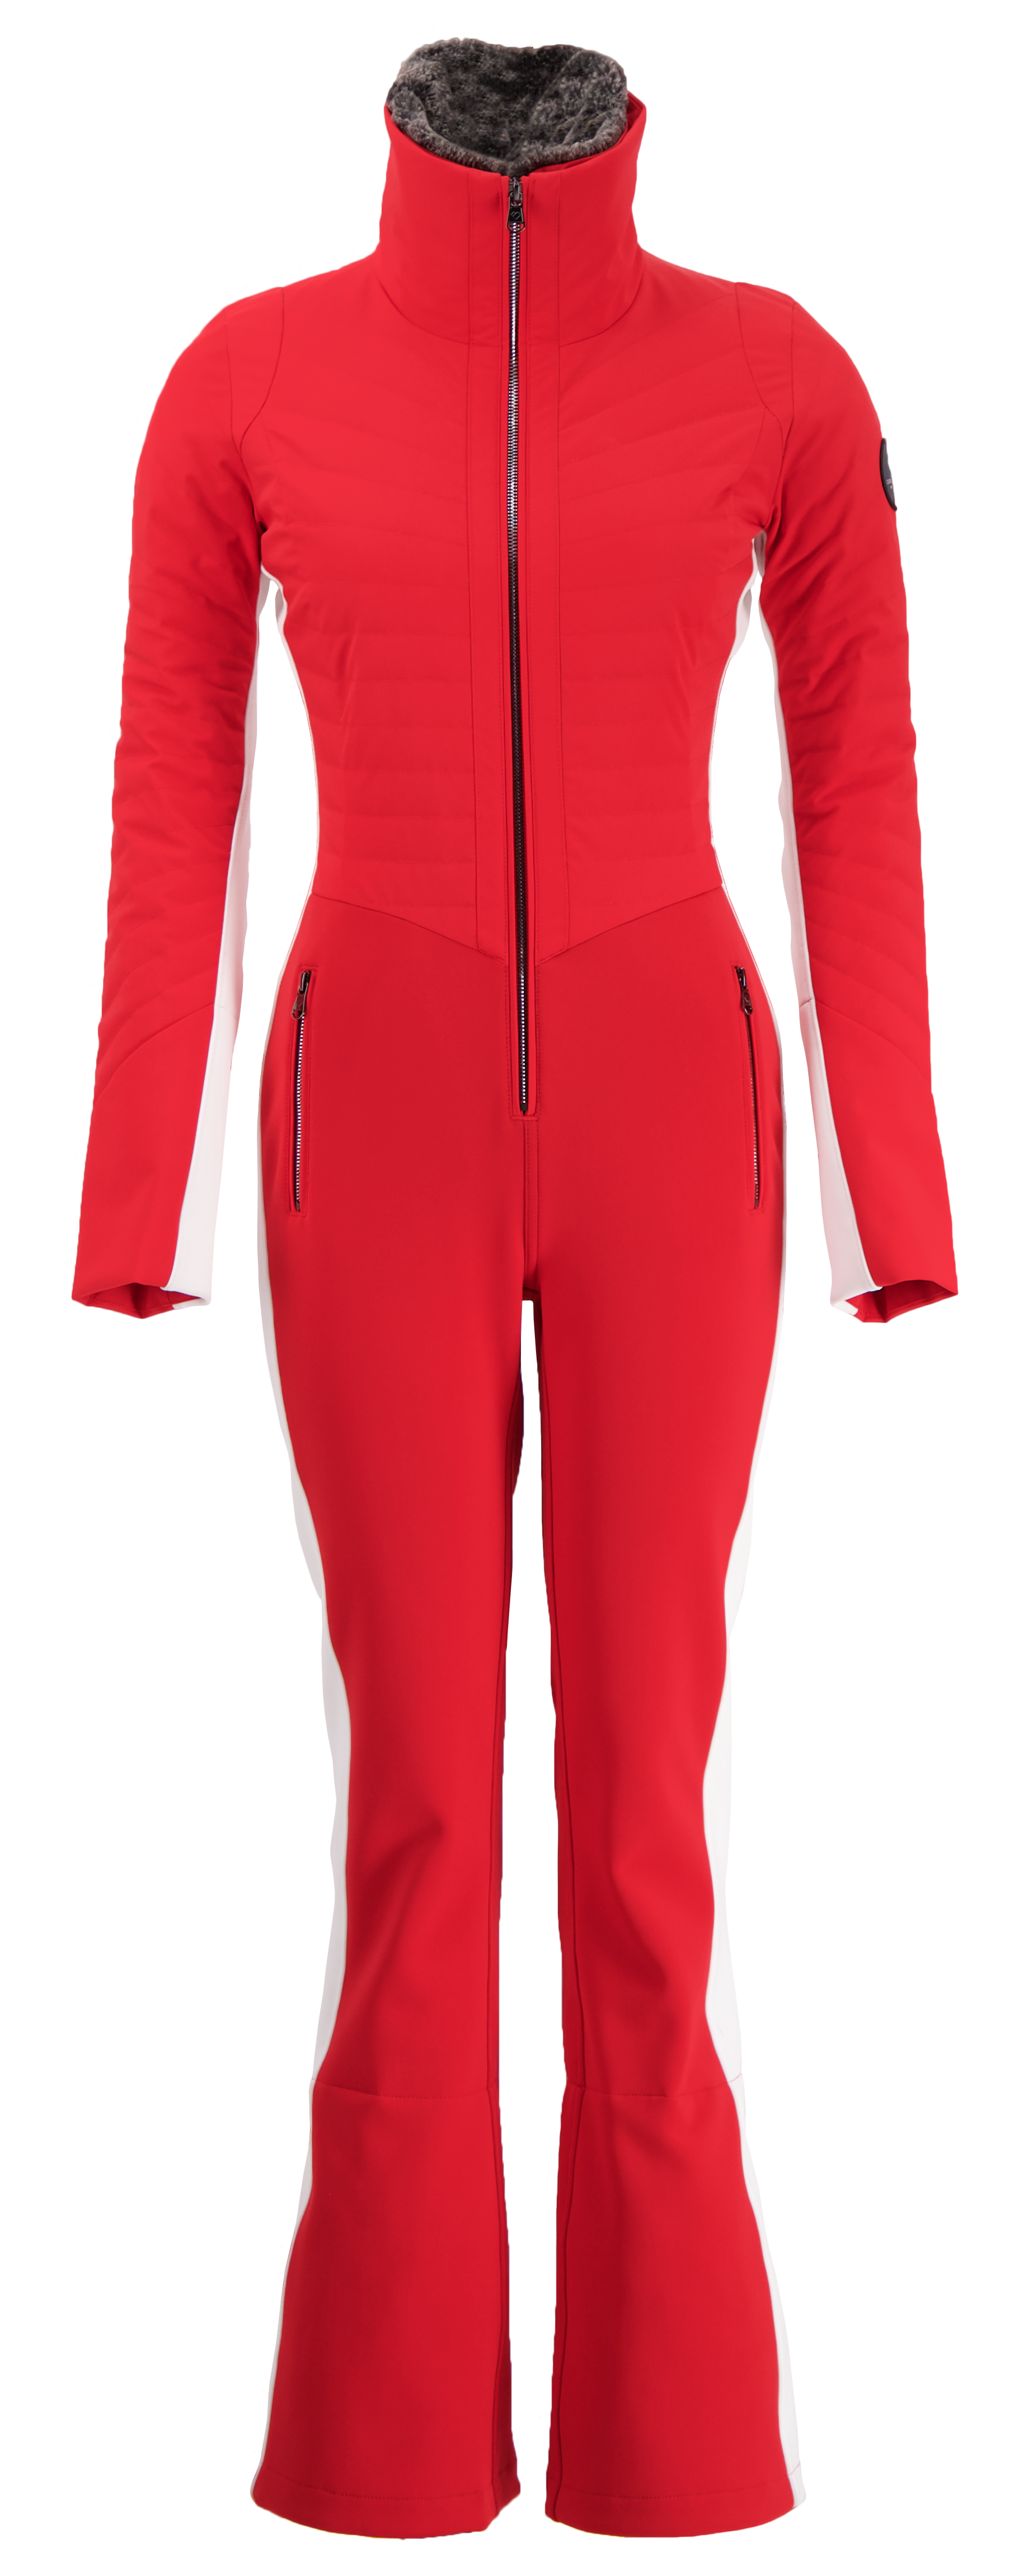 Lindsey Vonn Women's Super-G South Korea 2018 Olympics